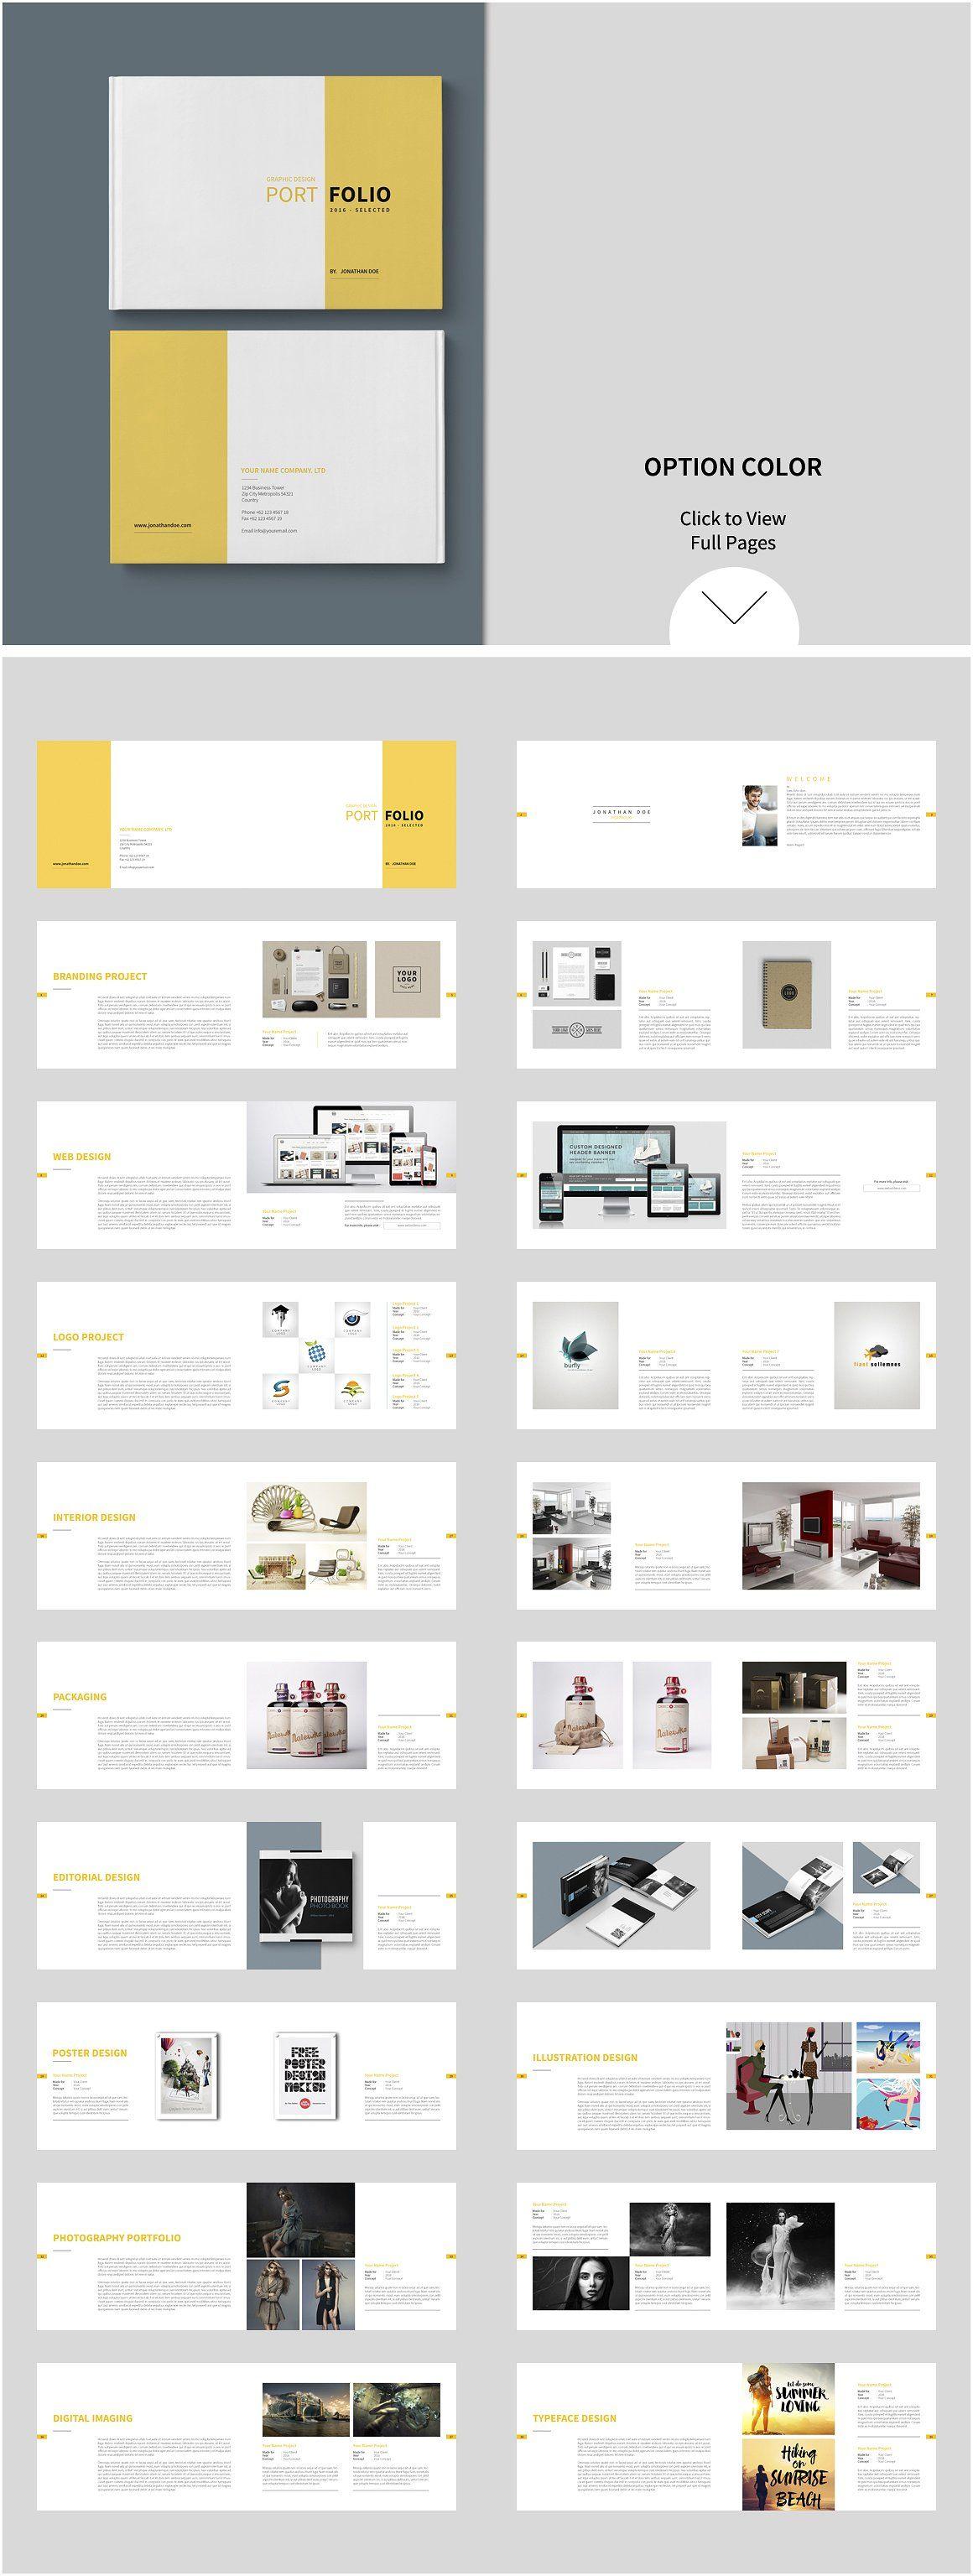 Graphic Design Portfolio Template By Tujuhbenua On Creativemarket Portfolio Design Layout Portfolio Template Design Portfolio Design